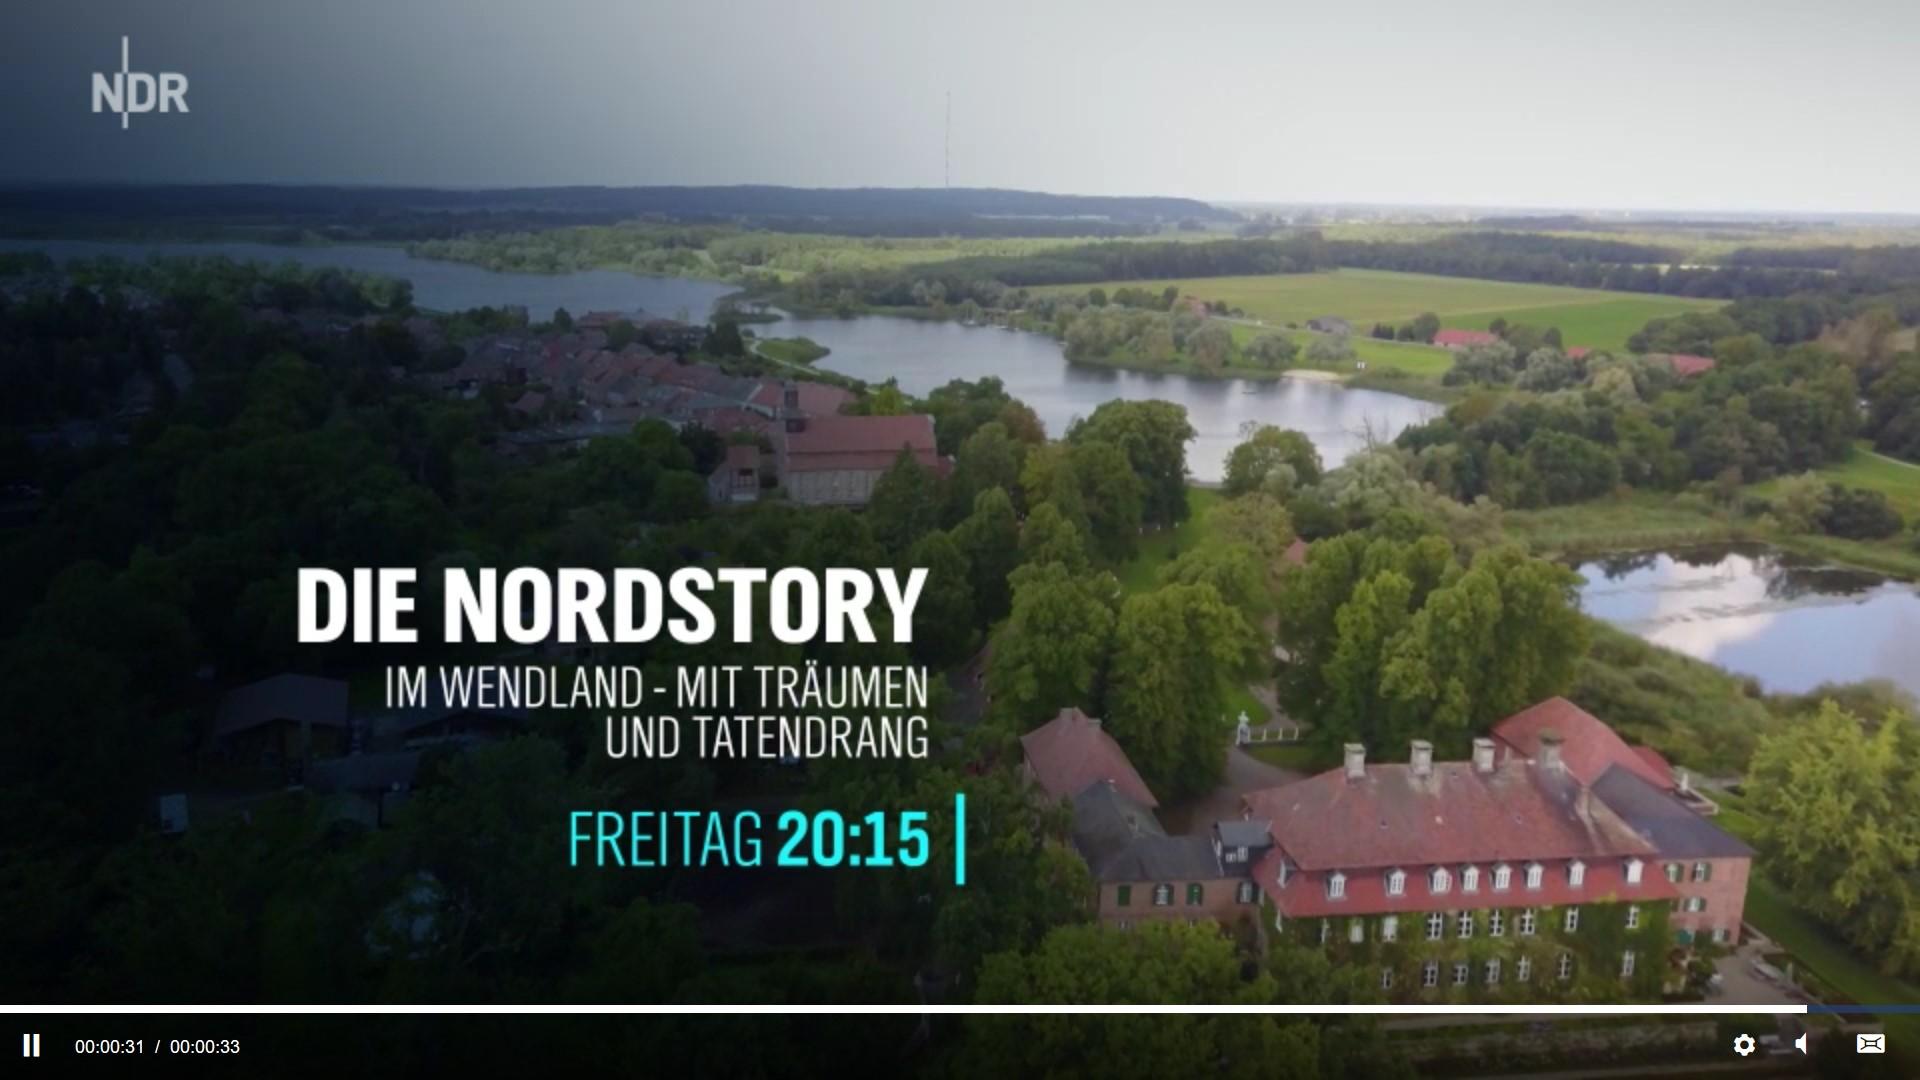 Nordstory